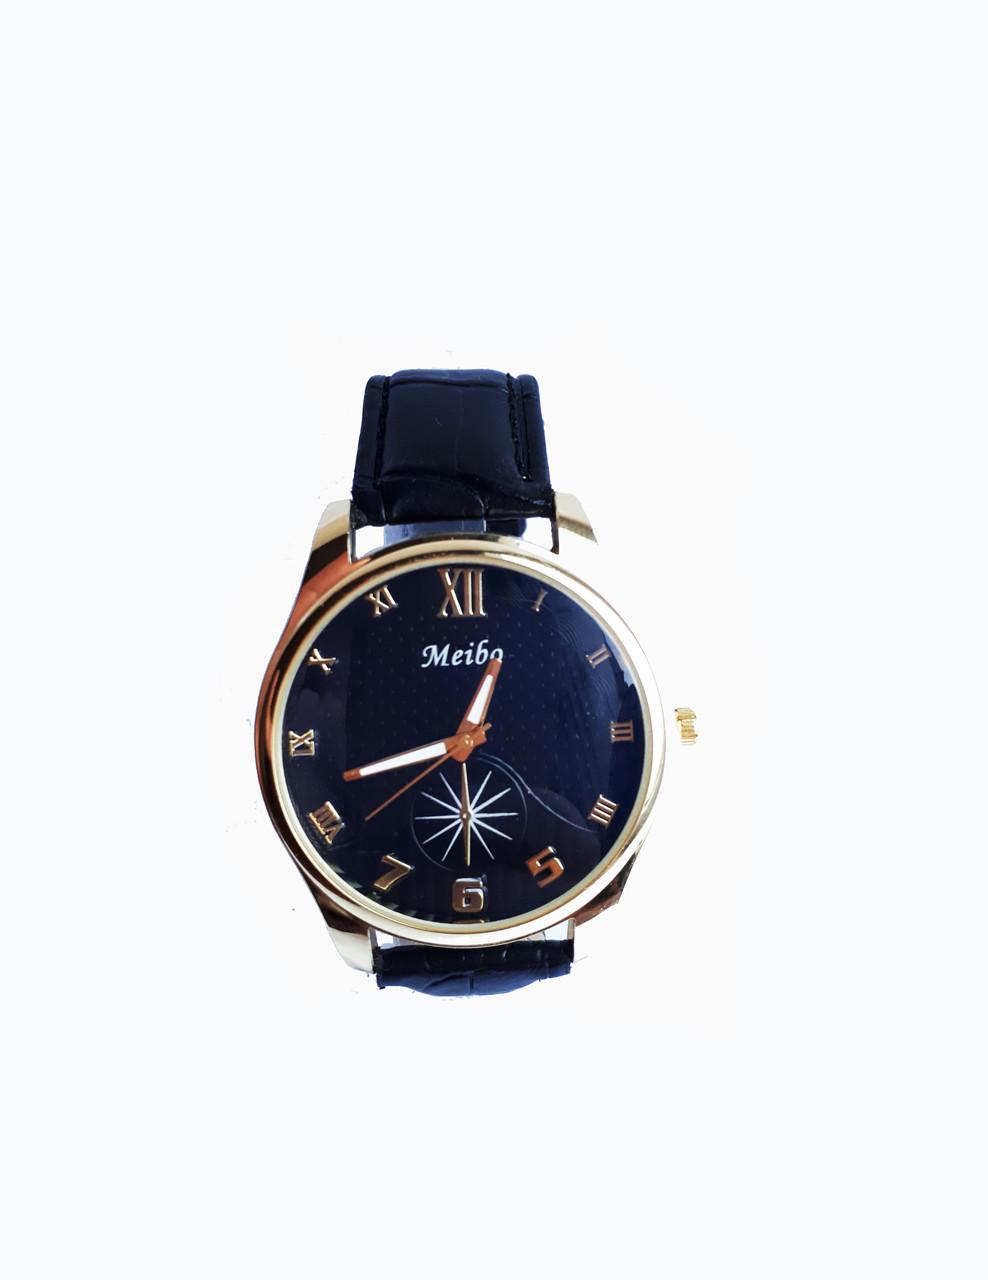 Часы кварцевые мужские Meibo New 46-04 черный